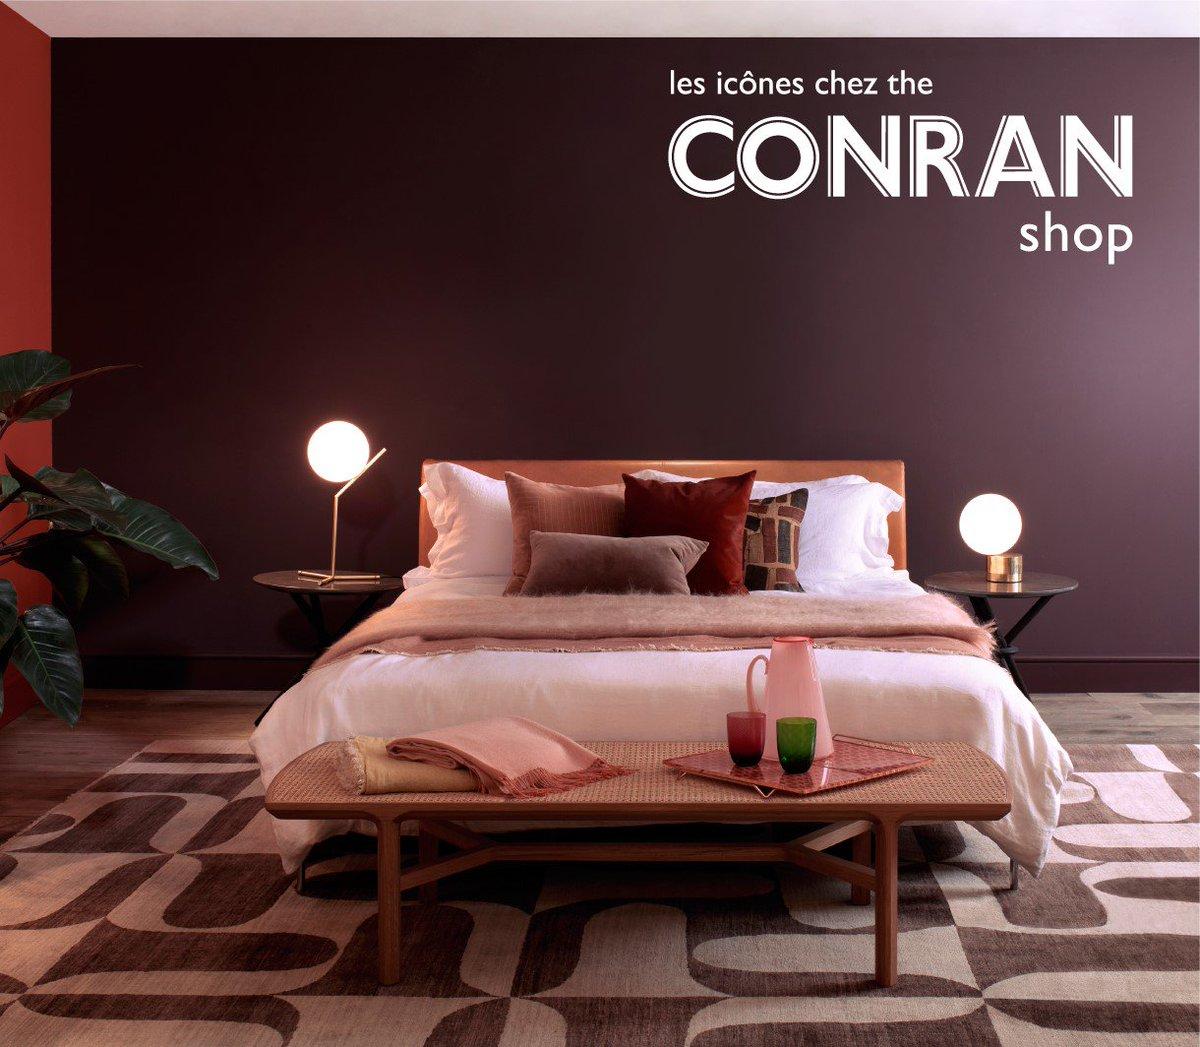 conran shop paris conranshopparis twitter. Black Bedroom Furniture Sets. Home Design Ideas